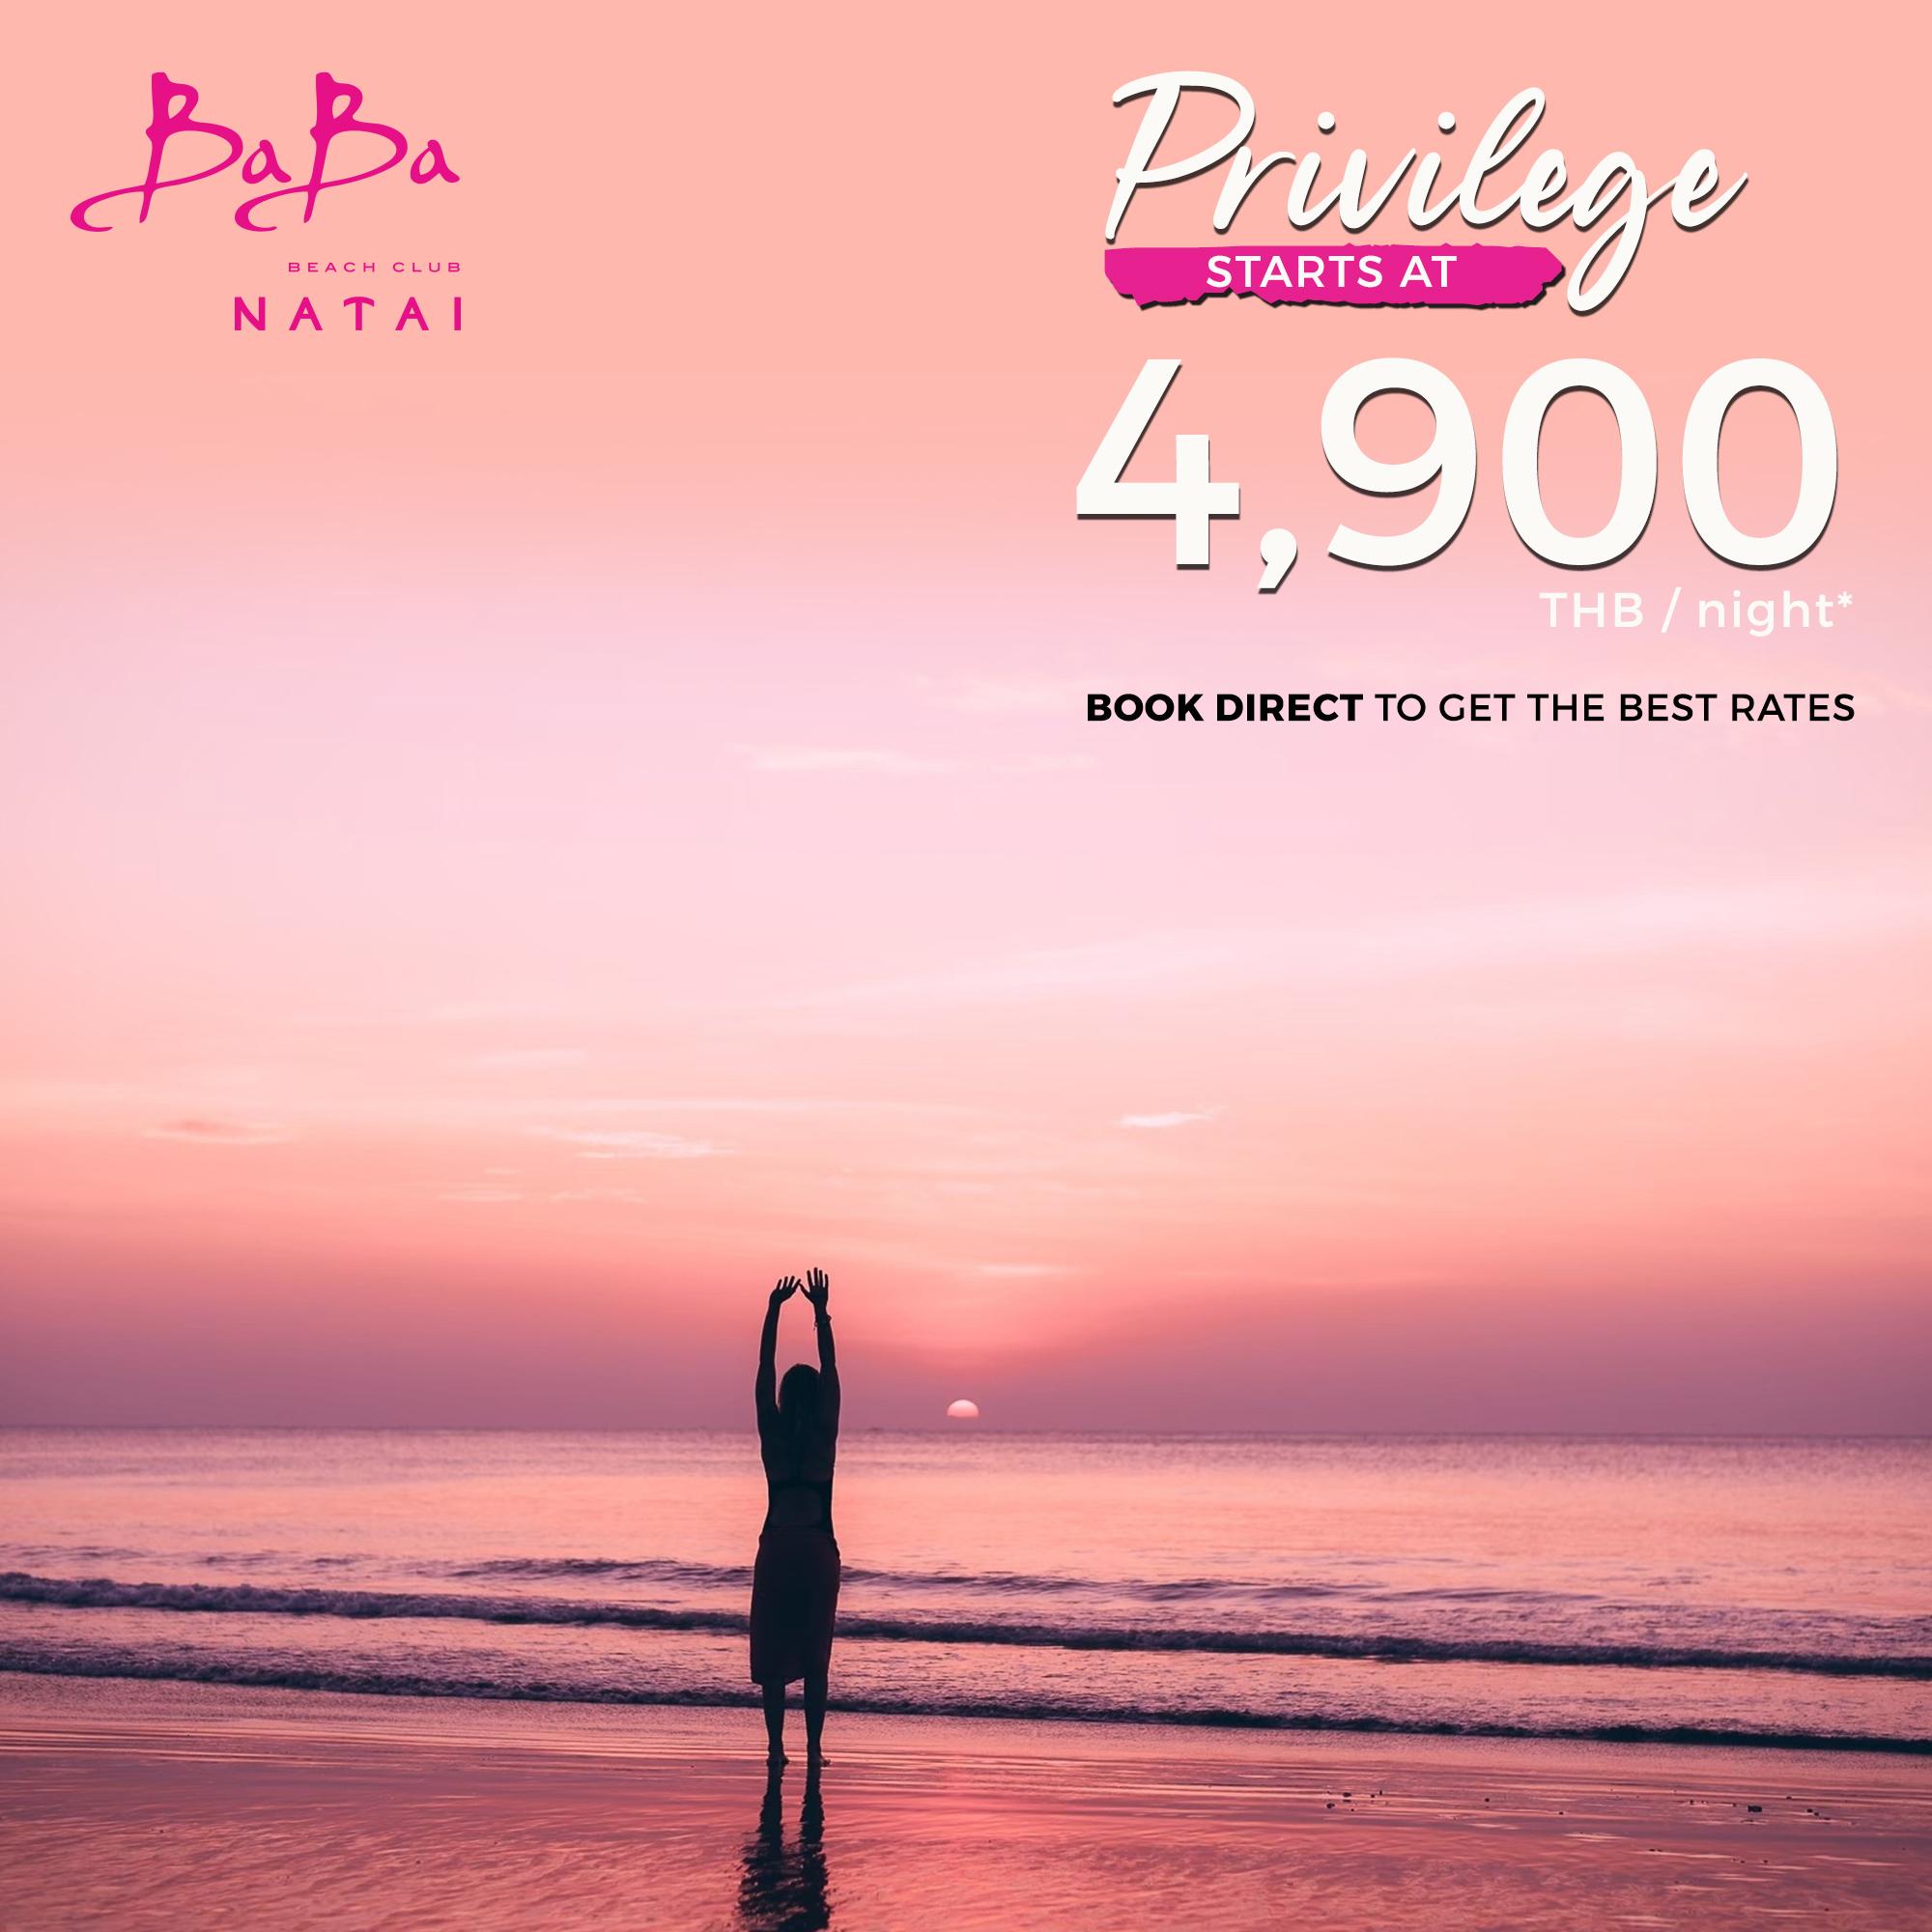 Baba Beach Club Privilege at Phuket 2020